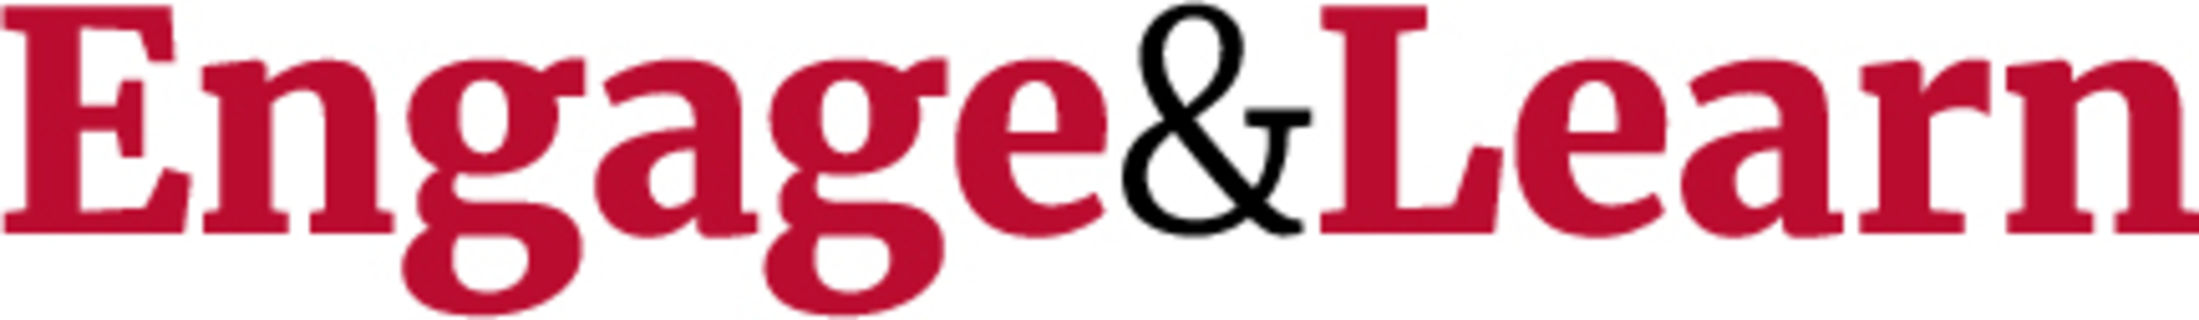 UGA Staff Mentor Program logo 2